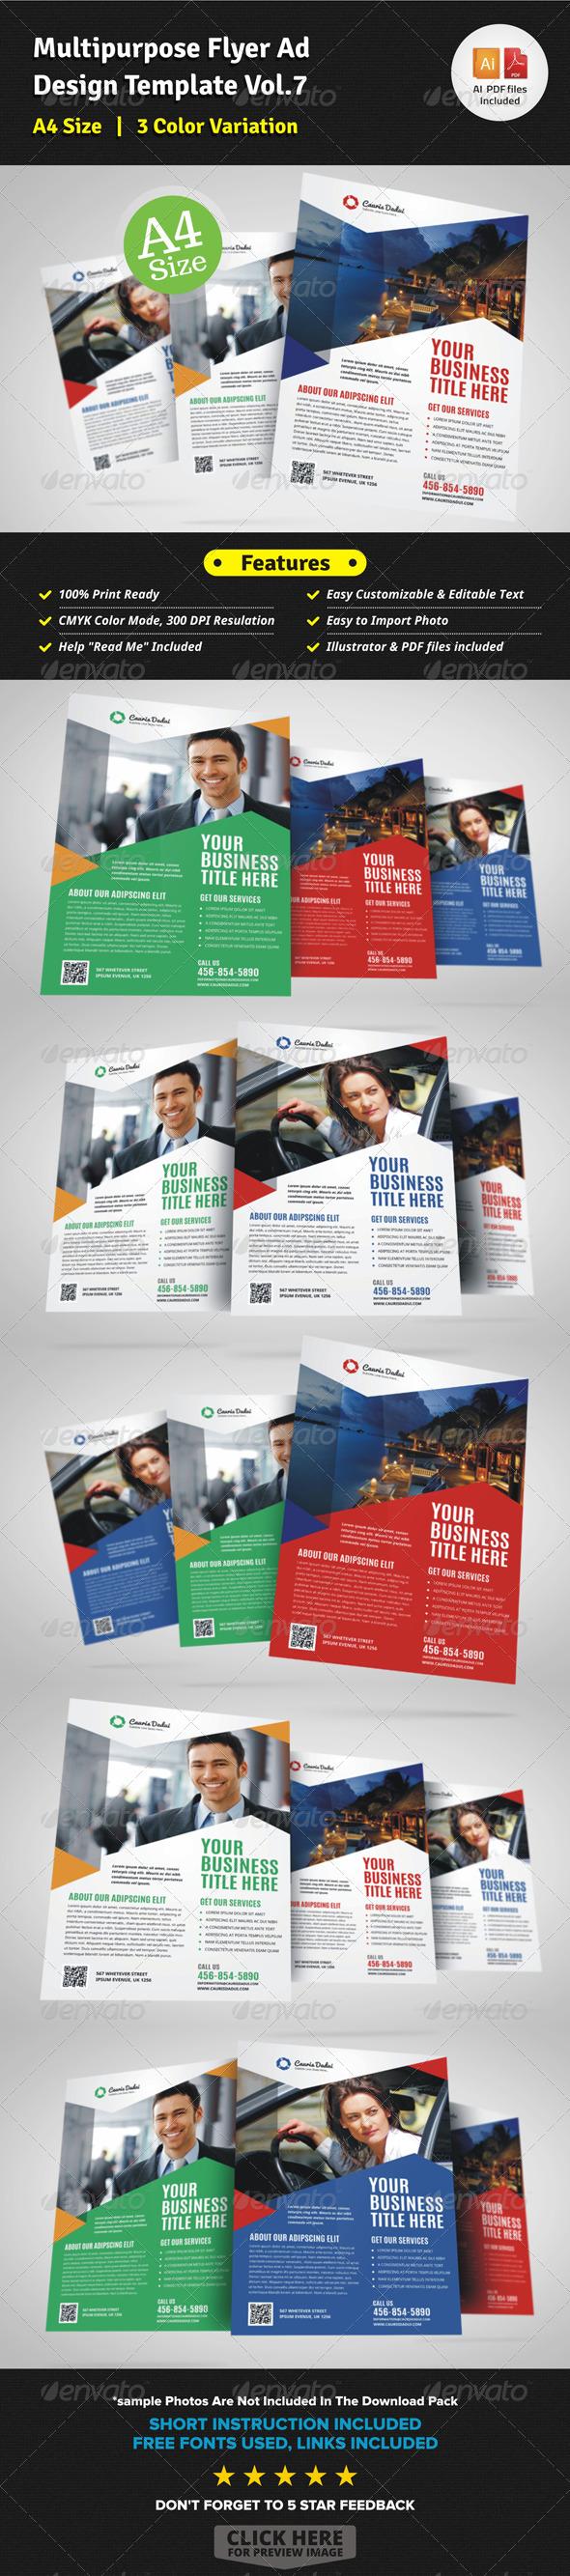 Multipurpose Business Flyer Template Vol.7 - Corporate Flyers